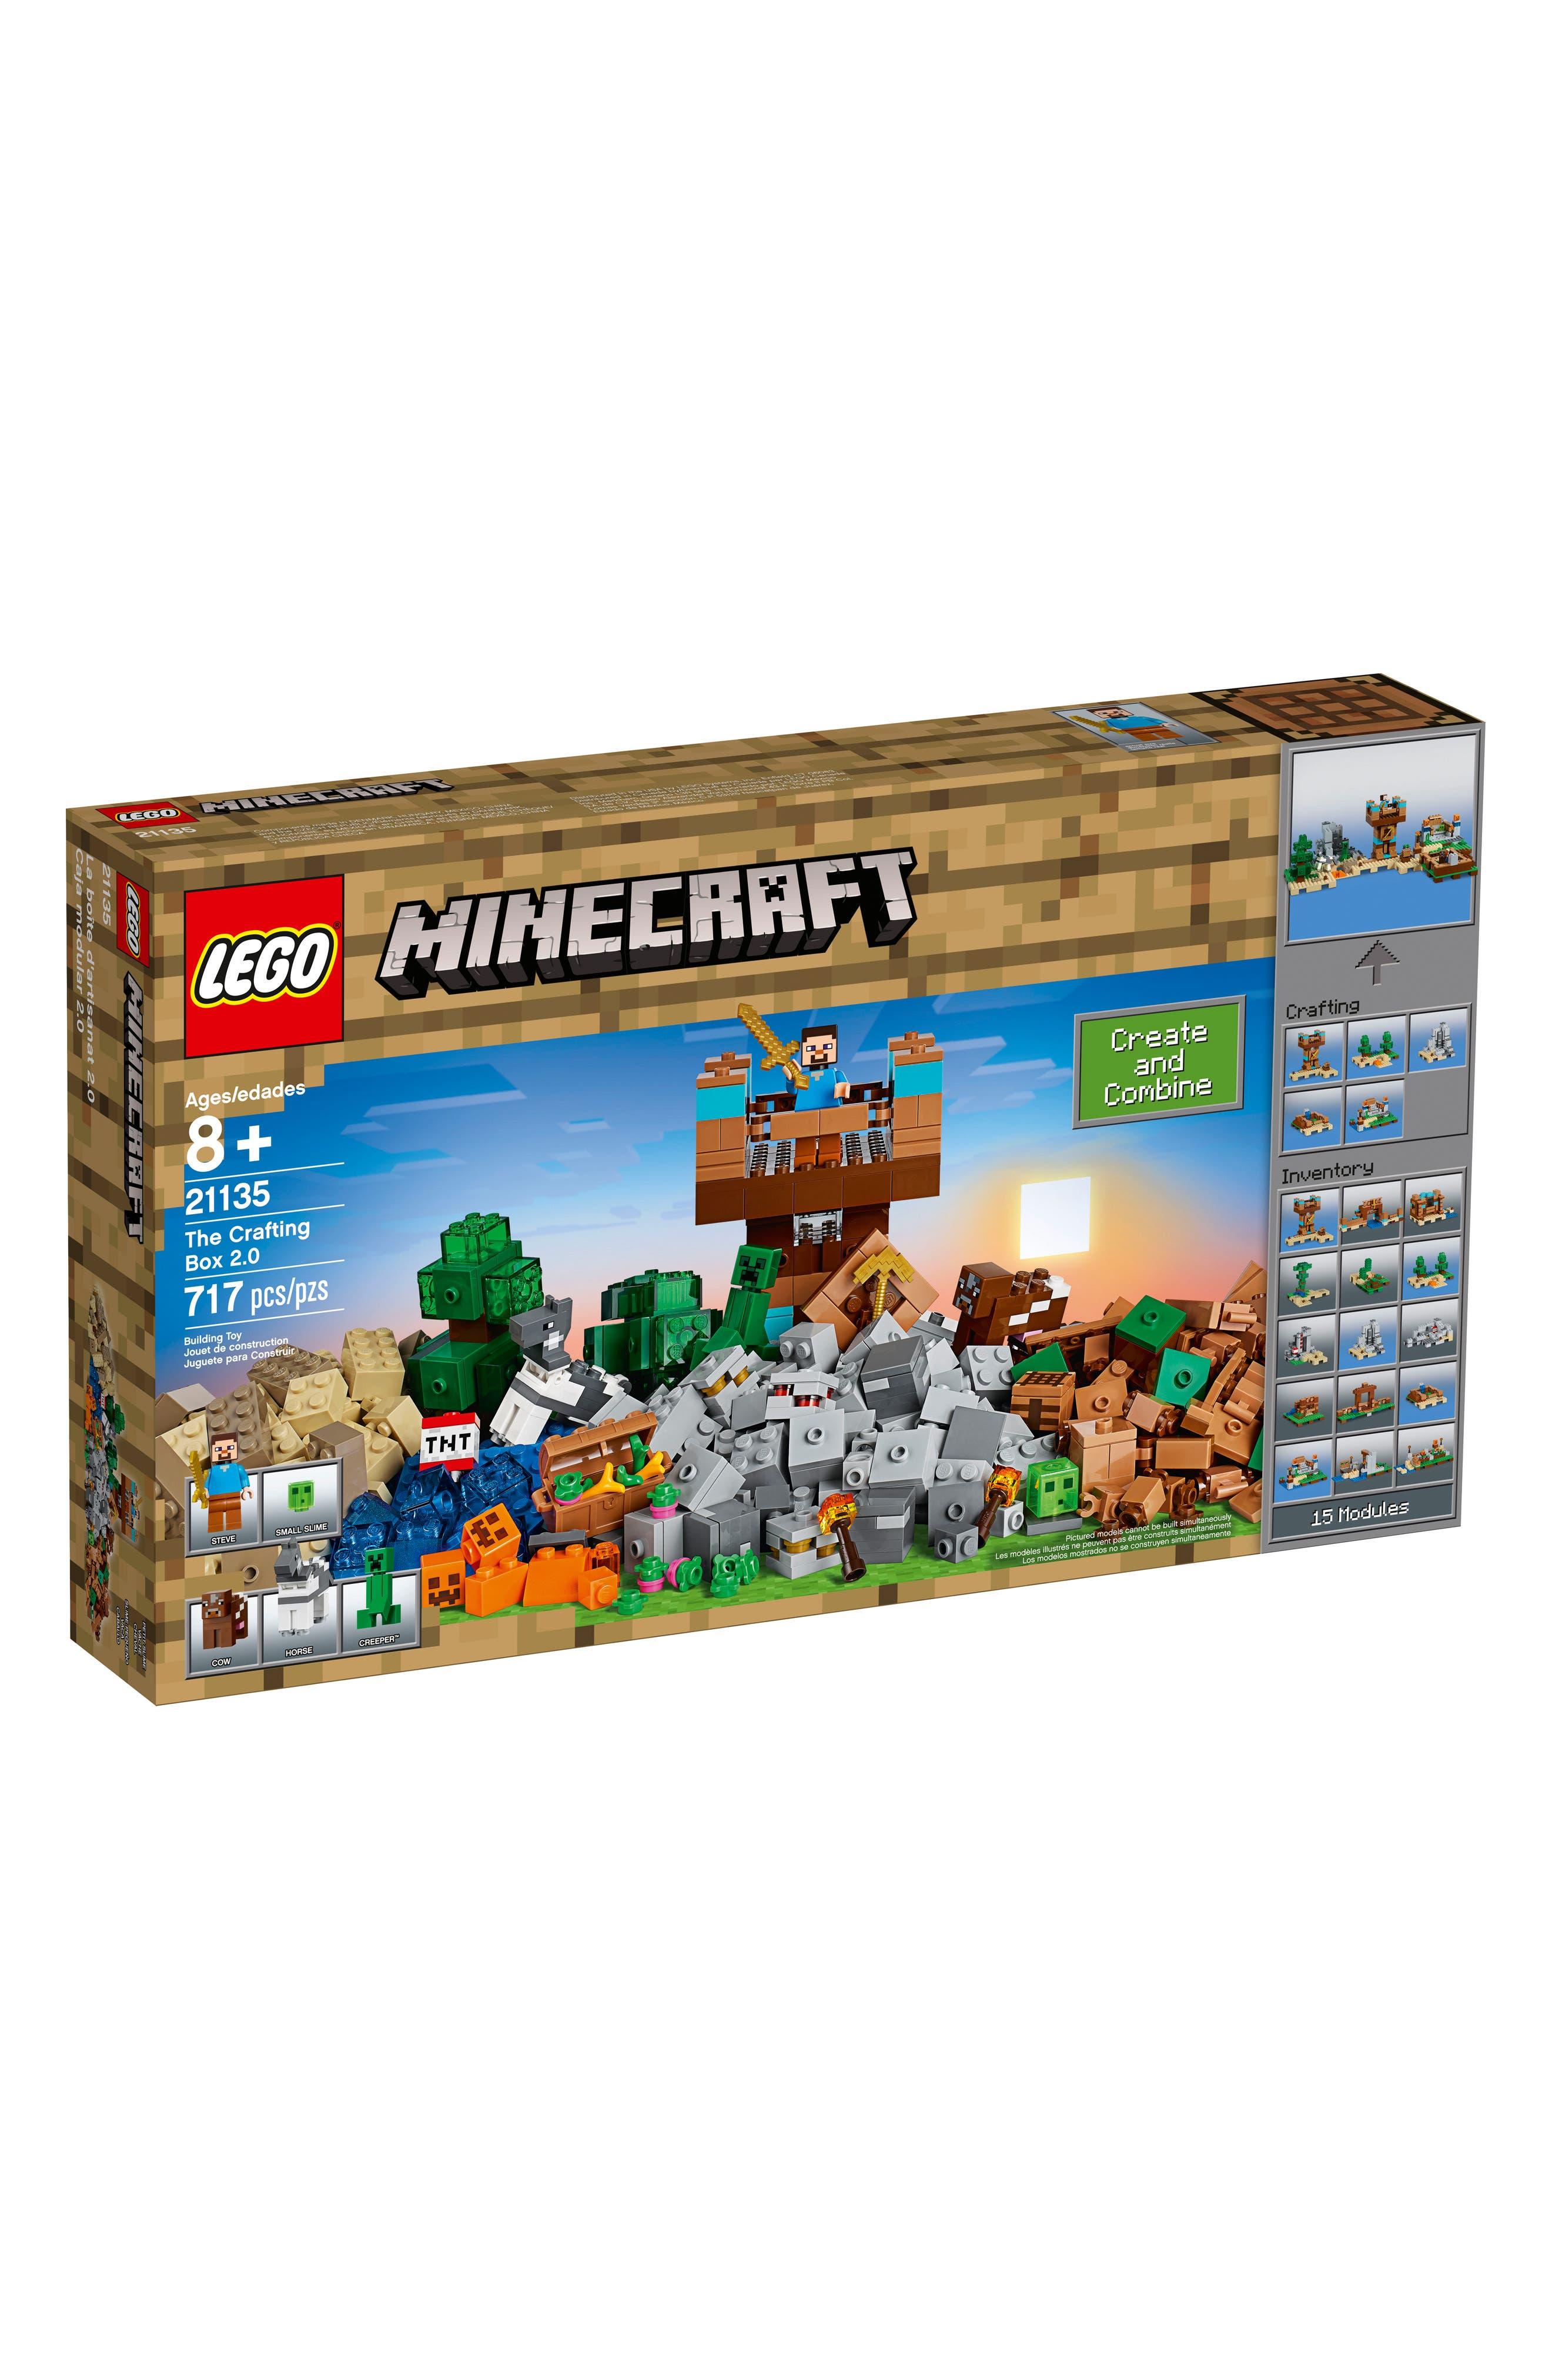 LEGO® Minecraft™ The Crafting Box 2.0 Play Set - 21135